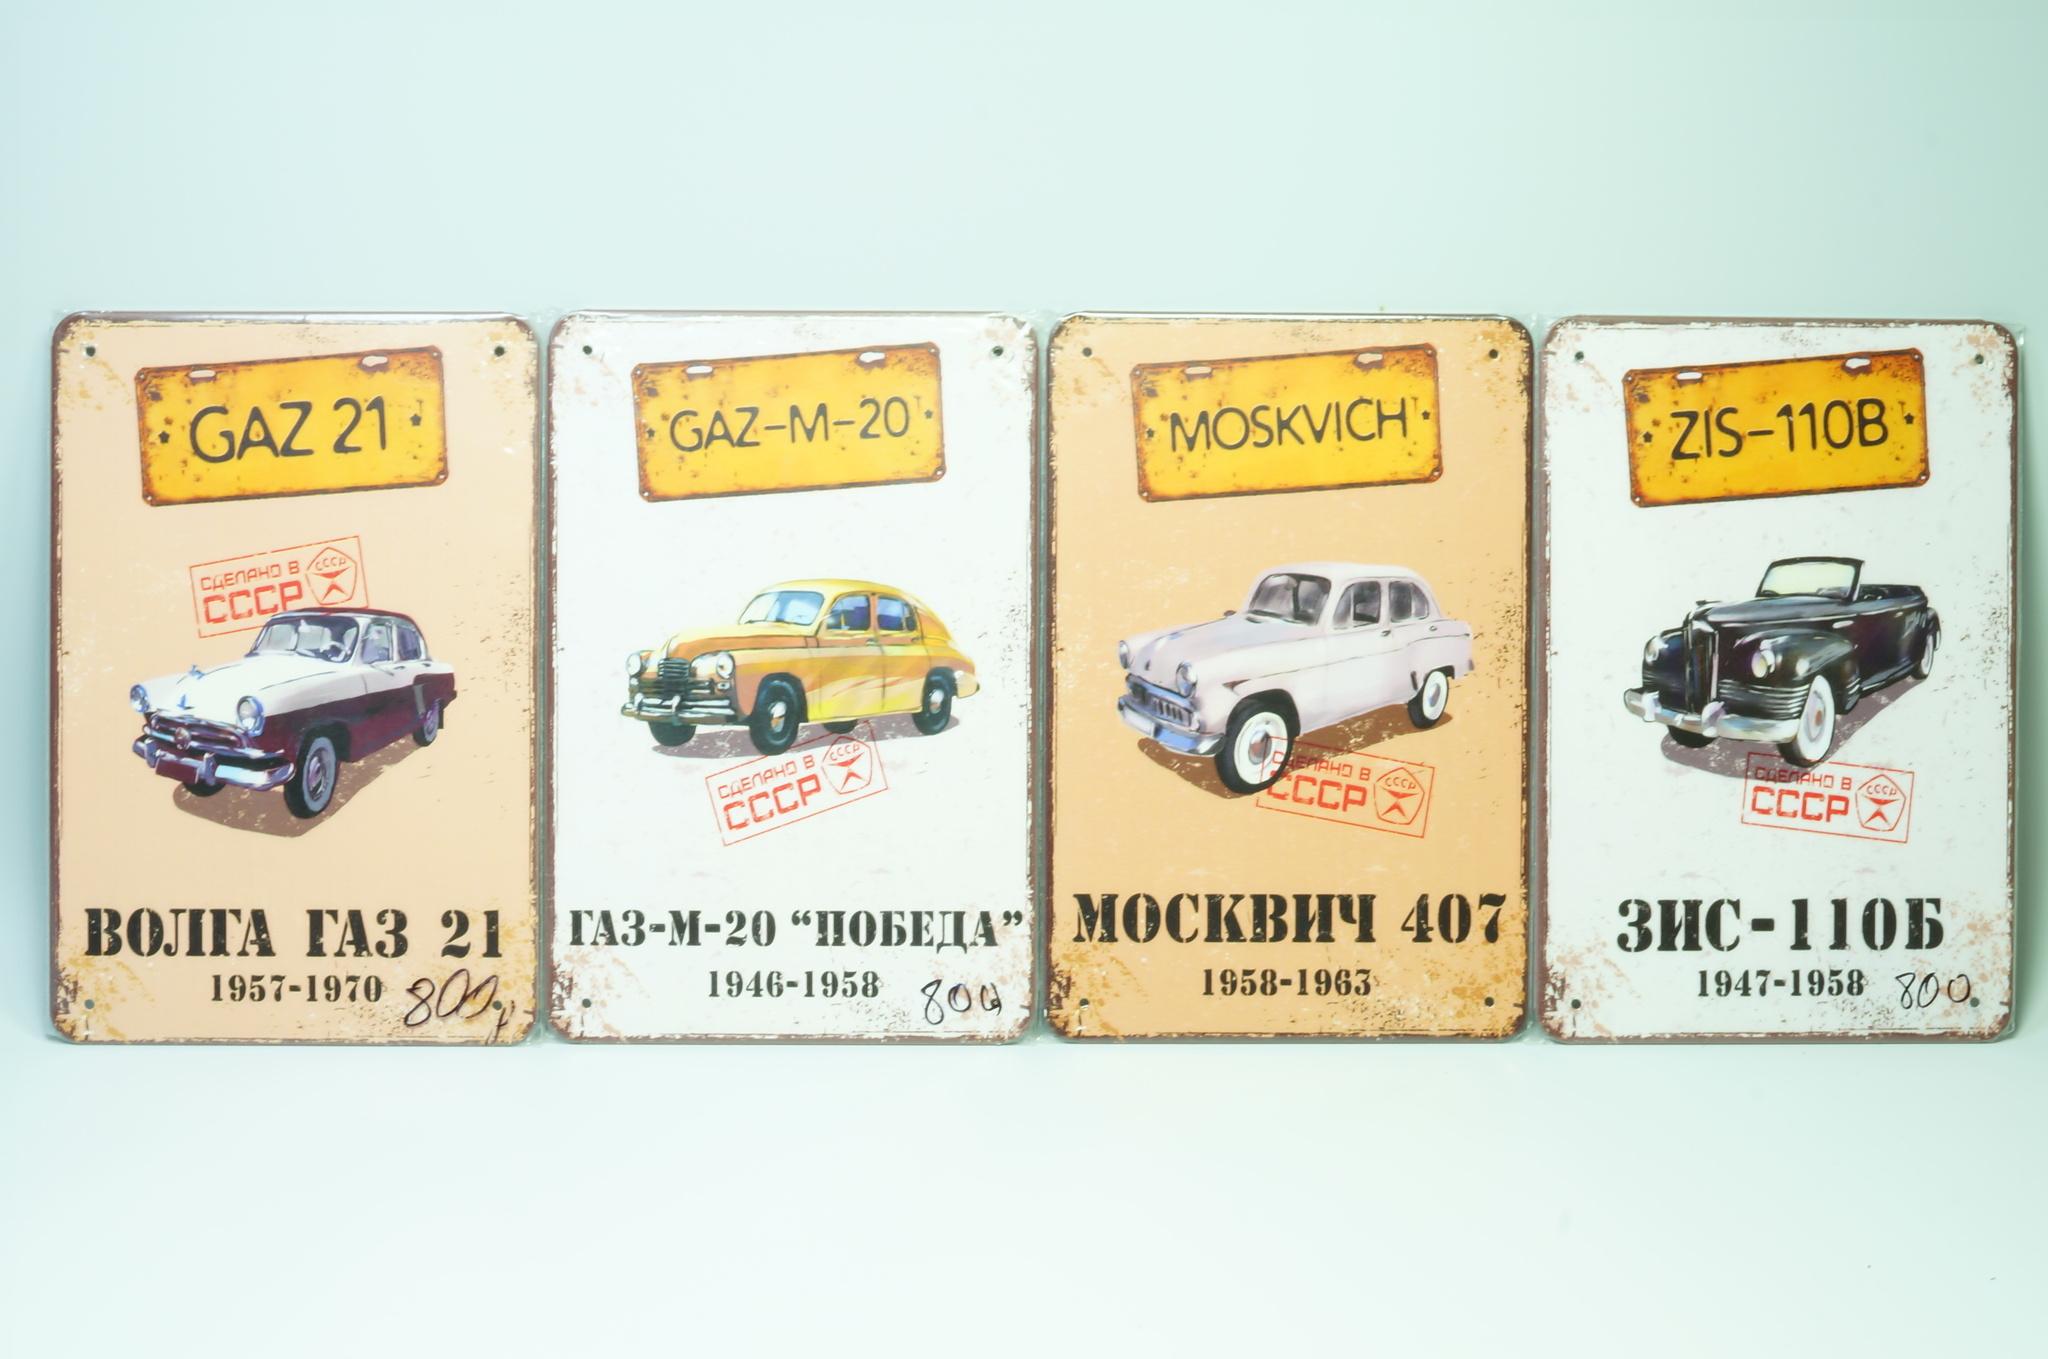 Декоративные таблички Газ 21, Победа, Москвич 407, Зис 110